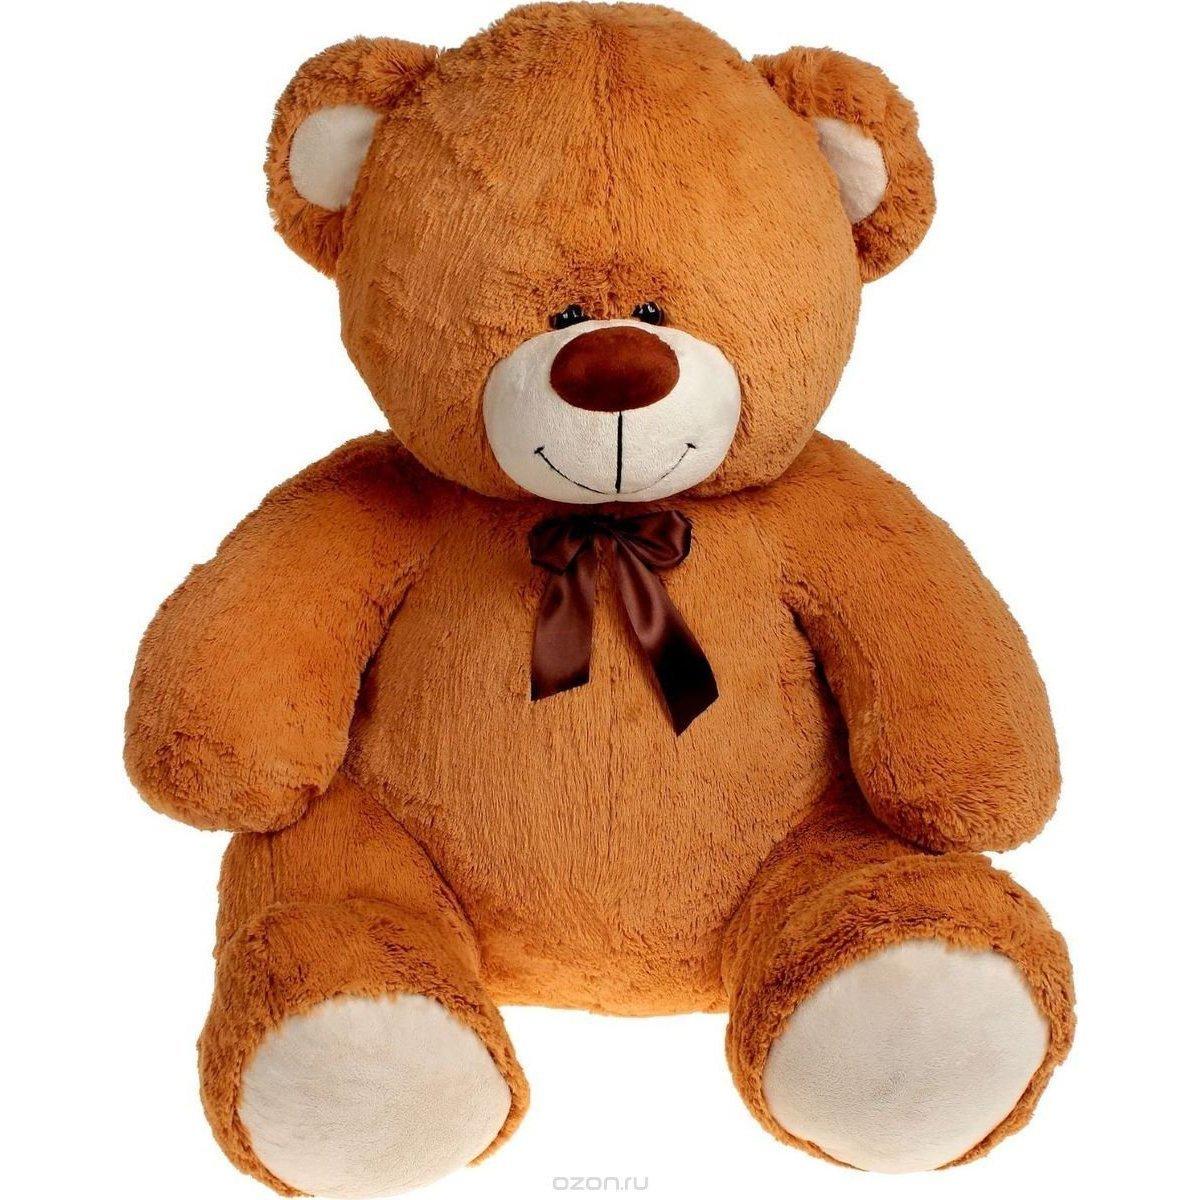 Картинки медвежат игрушек горло принято